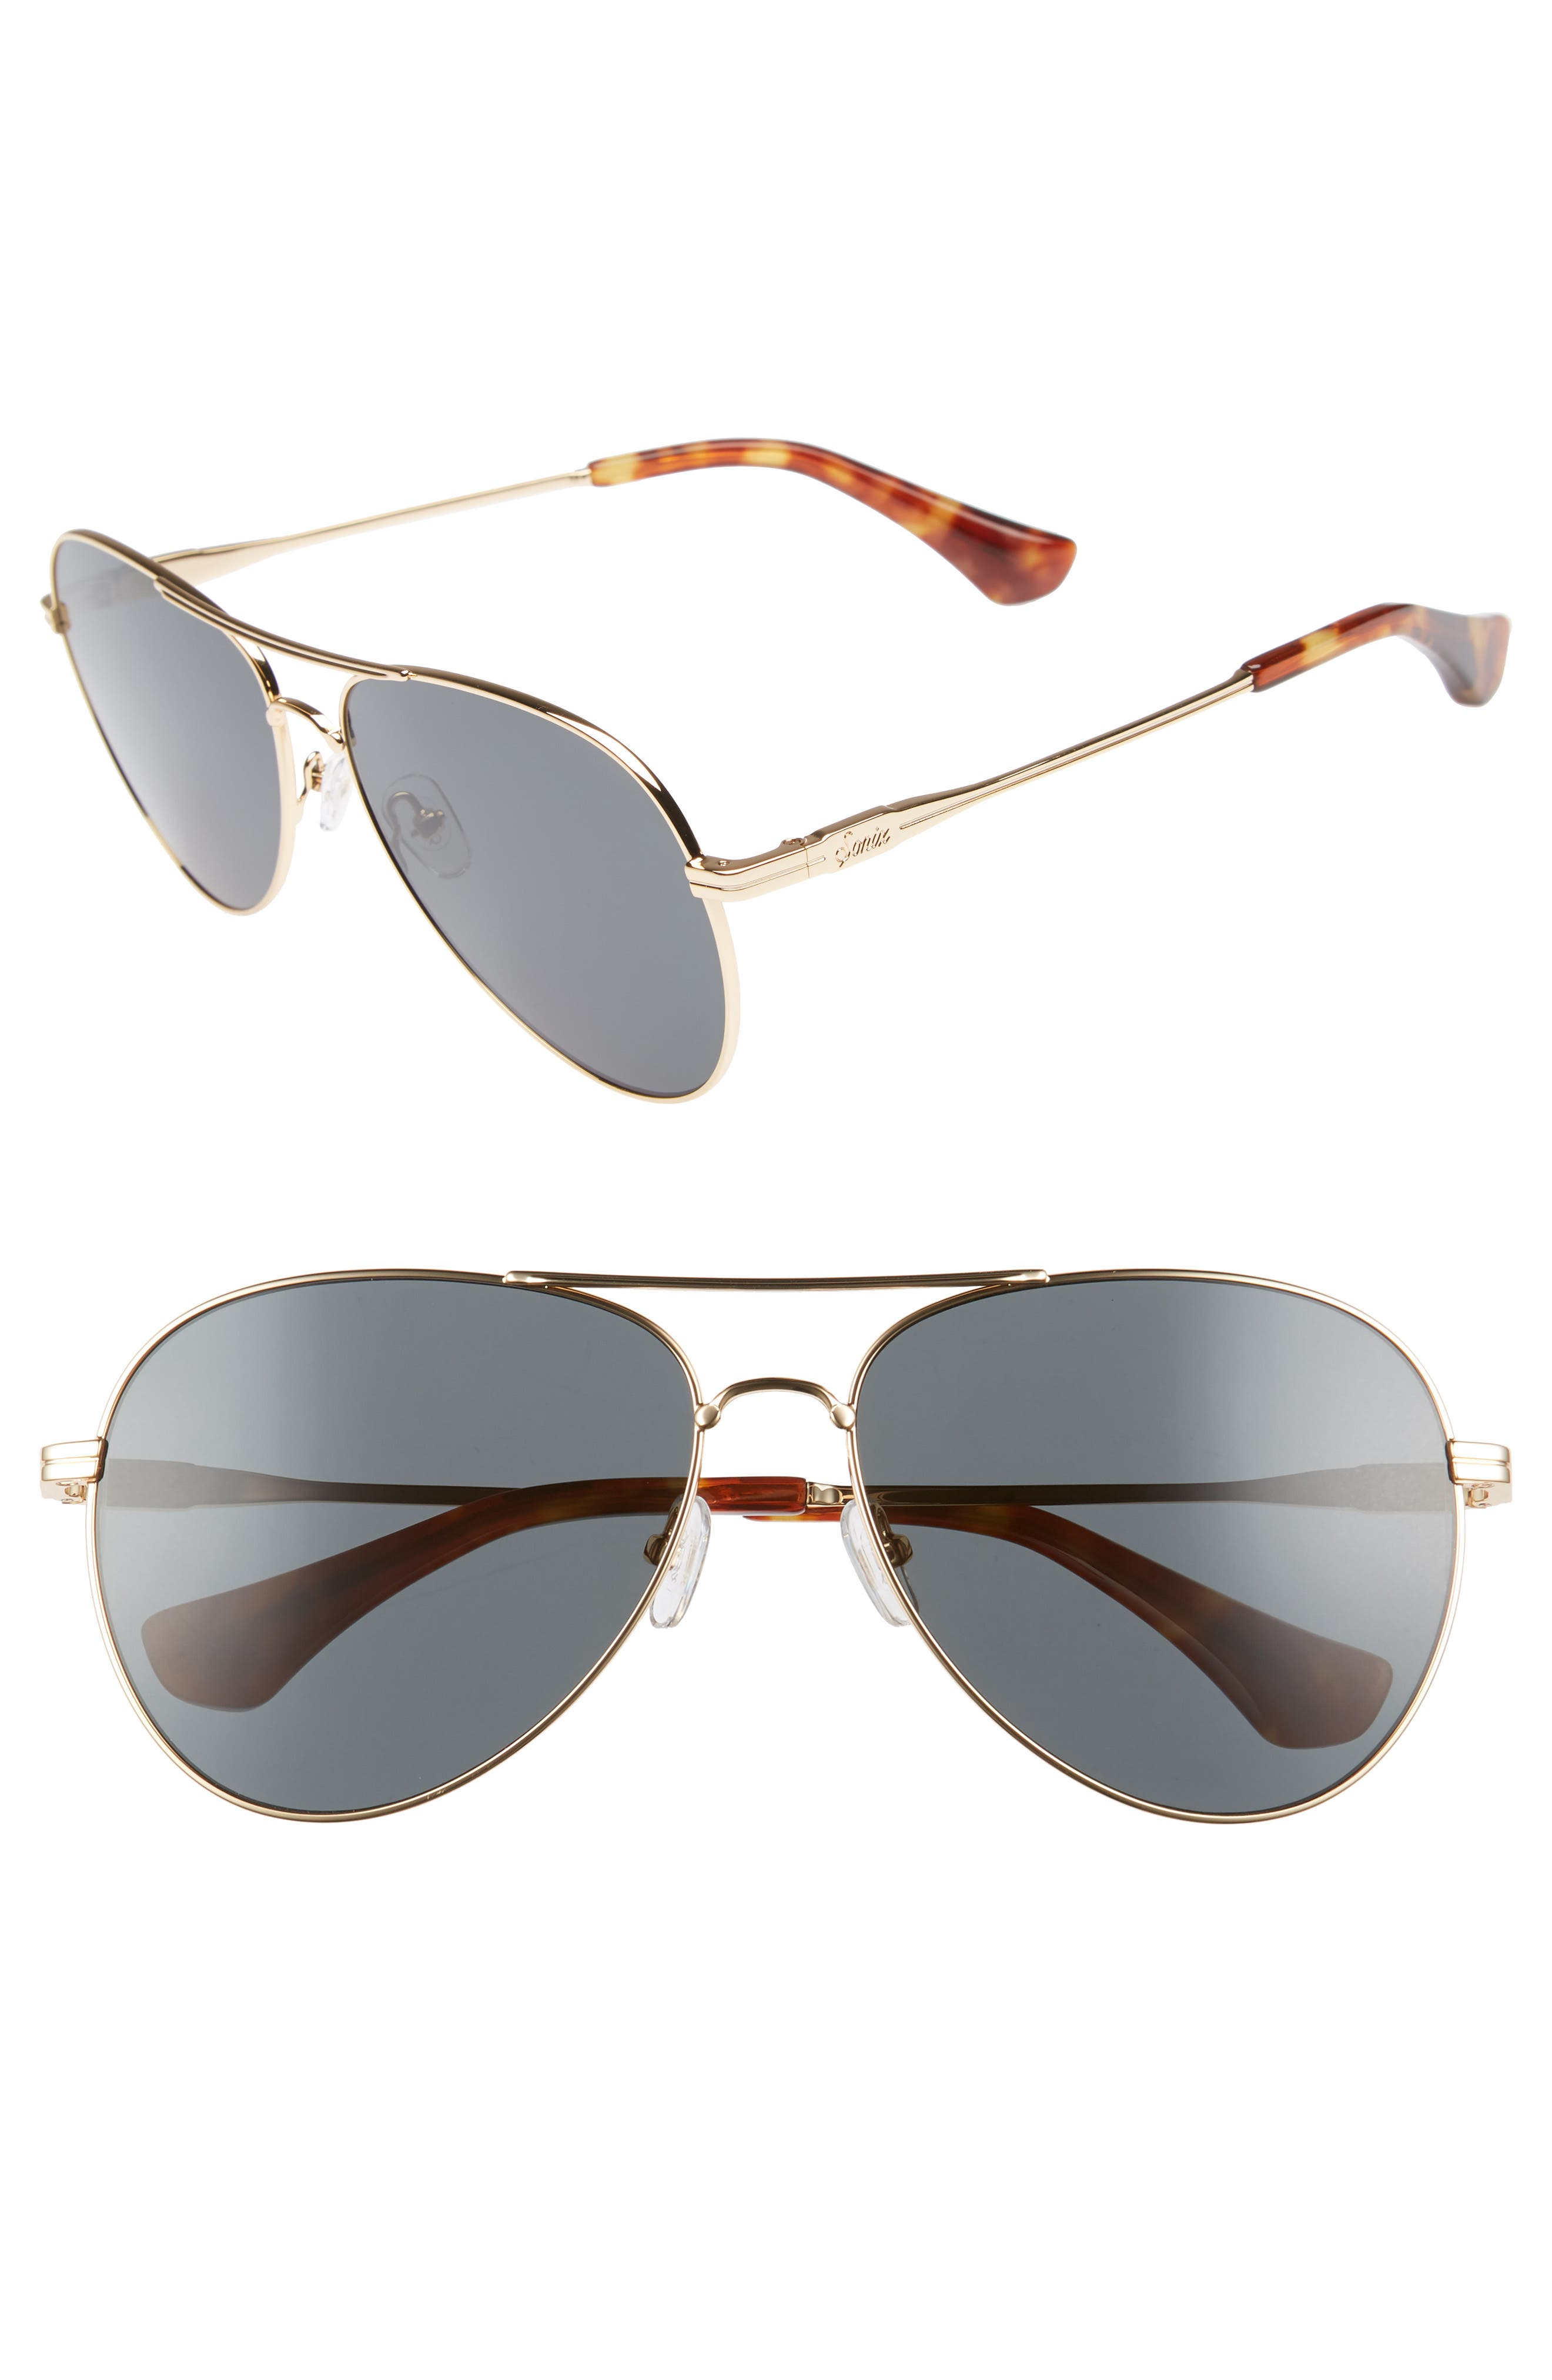 Lodi 61mm Mirrored Aviator Sunglasses,                             Main thumbnail 1, color,                             Gold Wire/ Black Solid